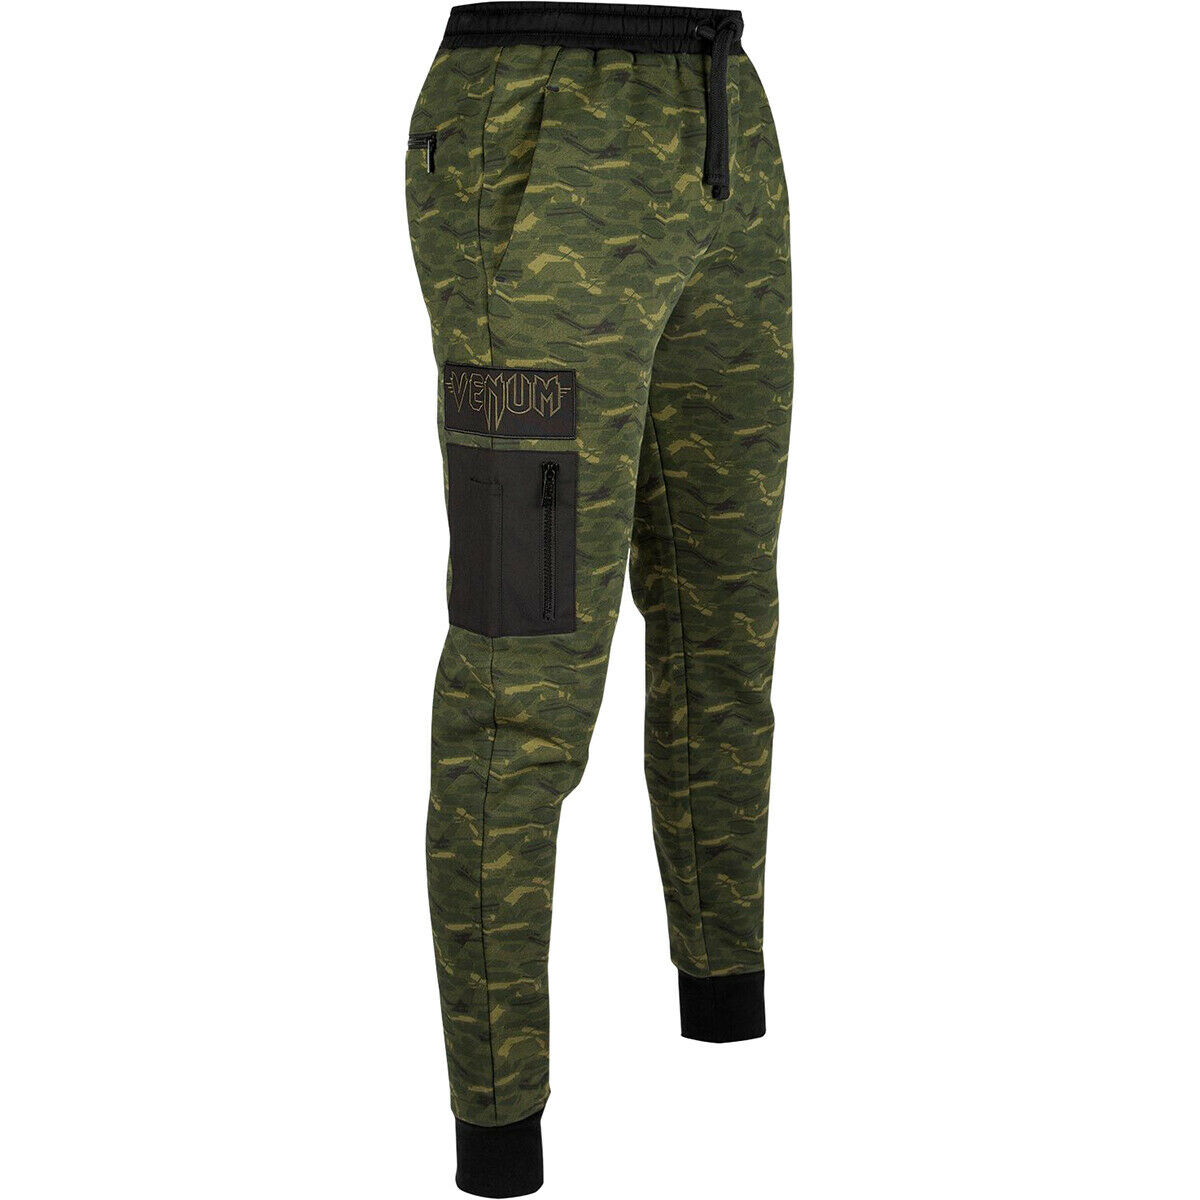 Venum Tramo 2.0  Jogging Pants - Khaki  welcome to buy